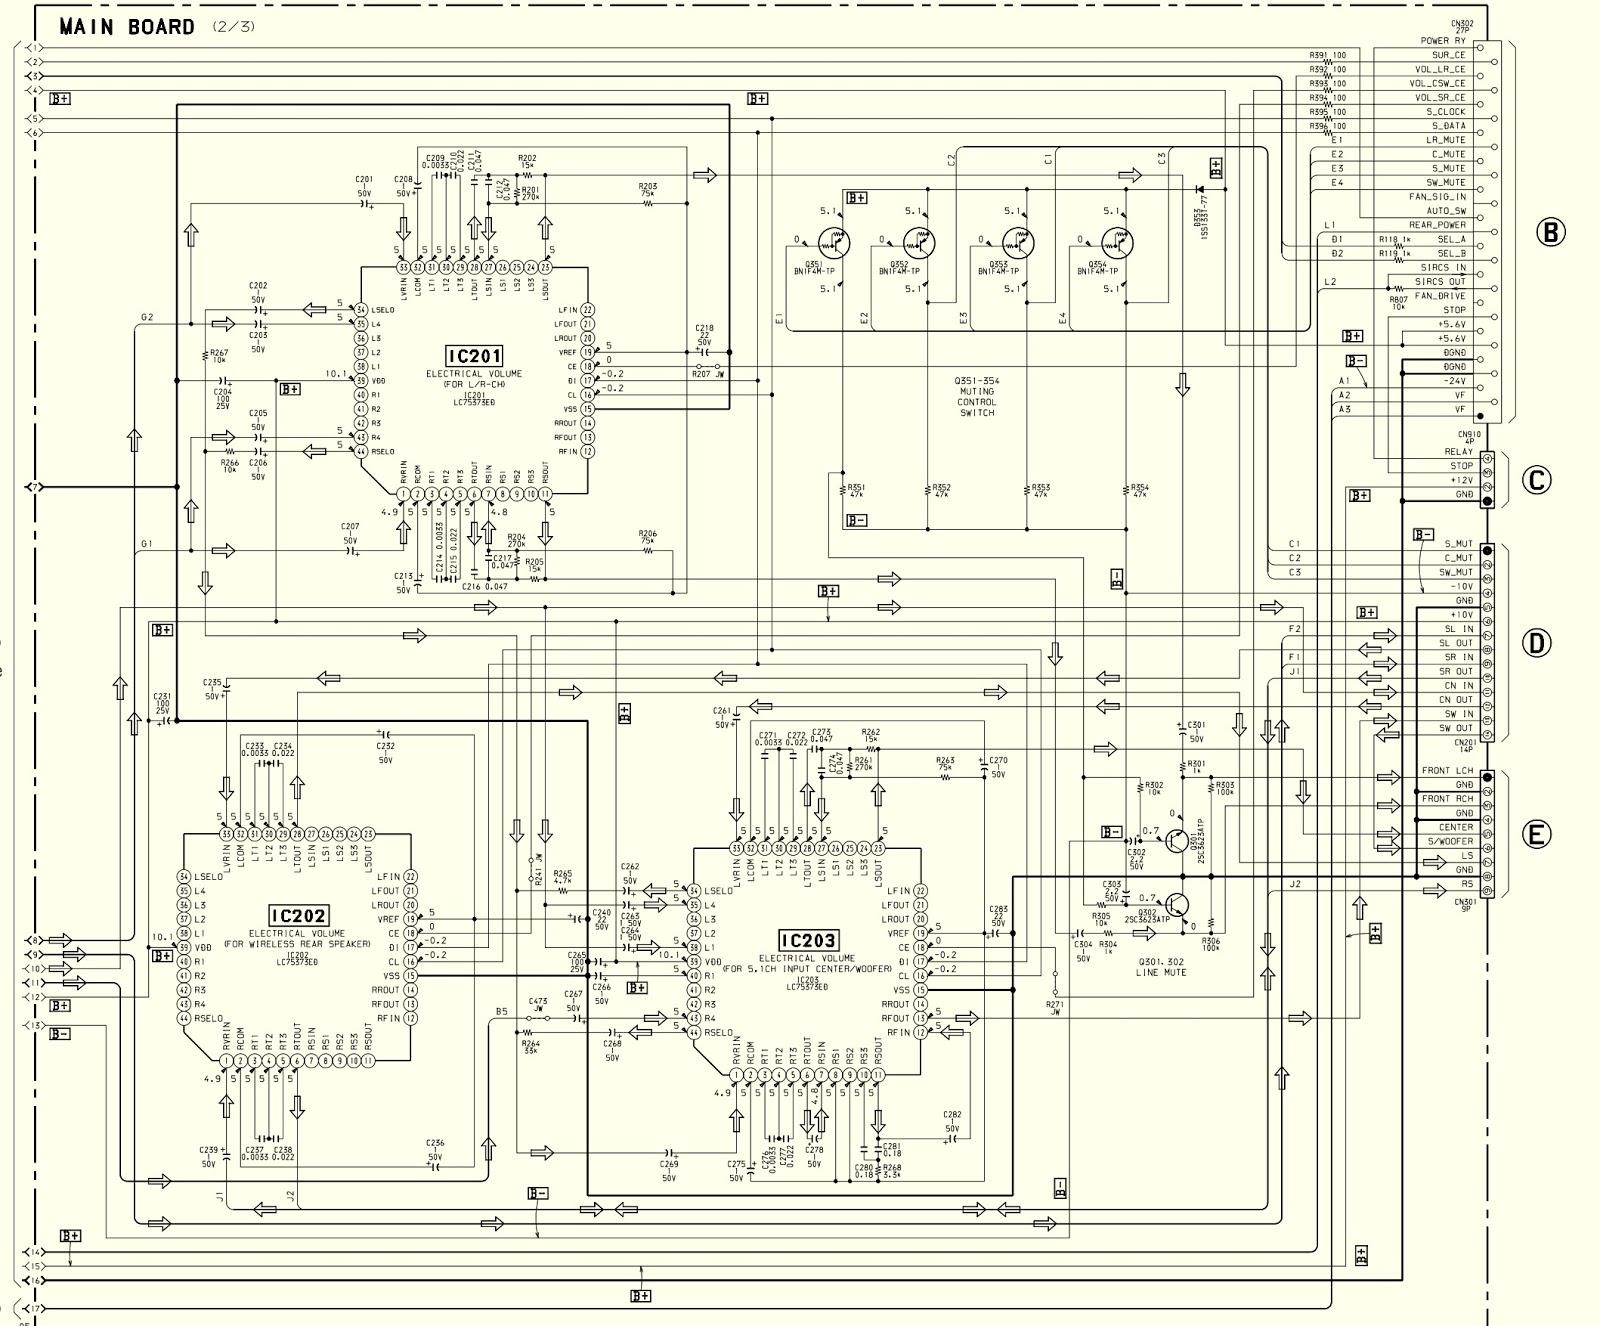 Electro Help  Sony Sava 500 Test Mode  U2013 Schematic Diagram